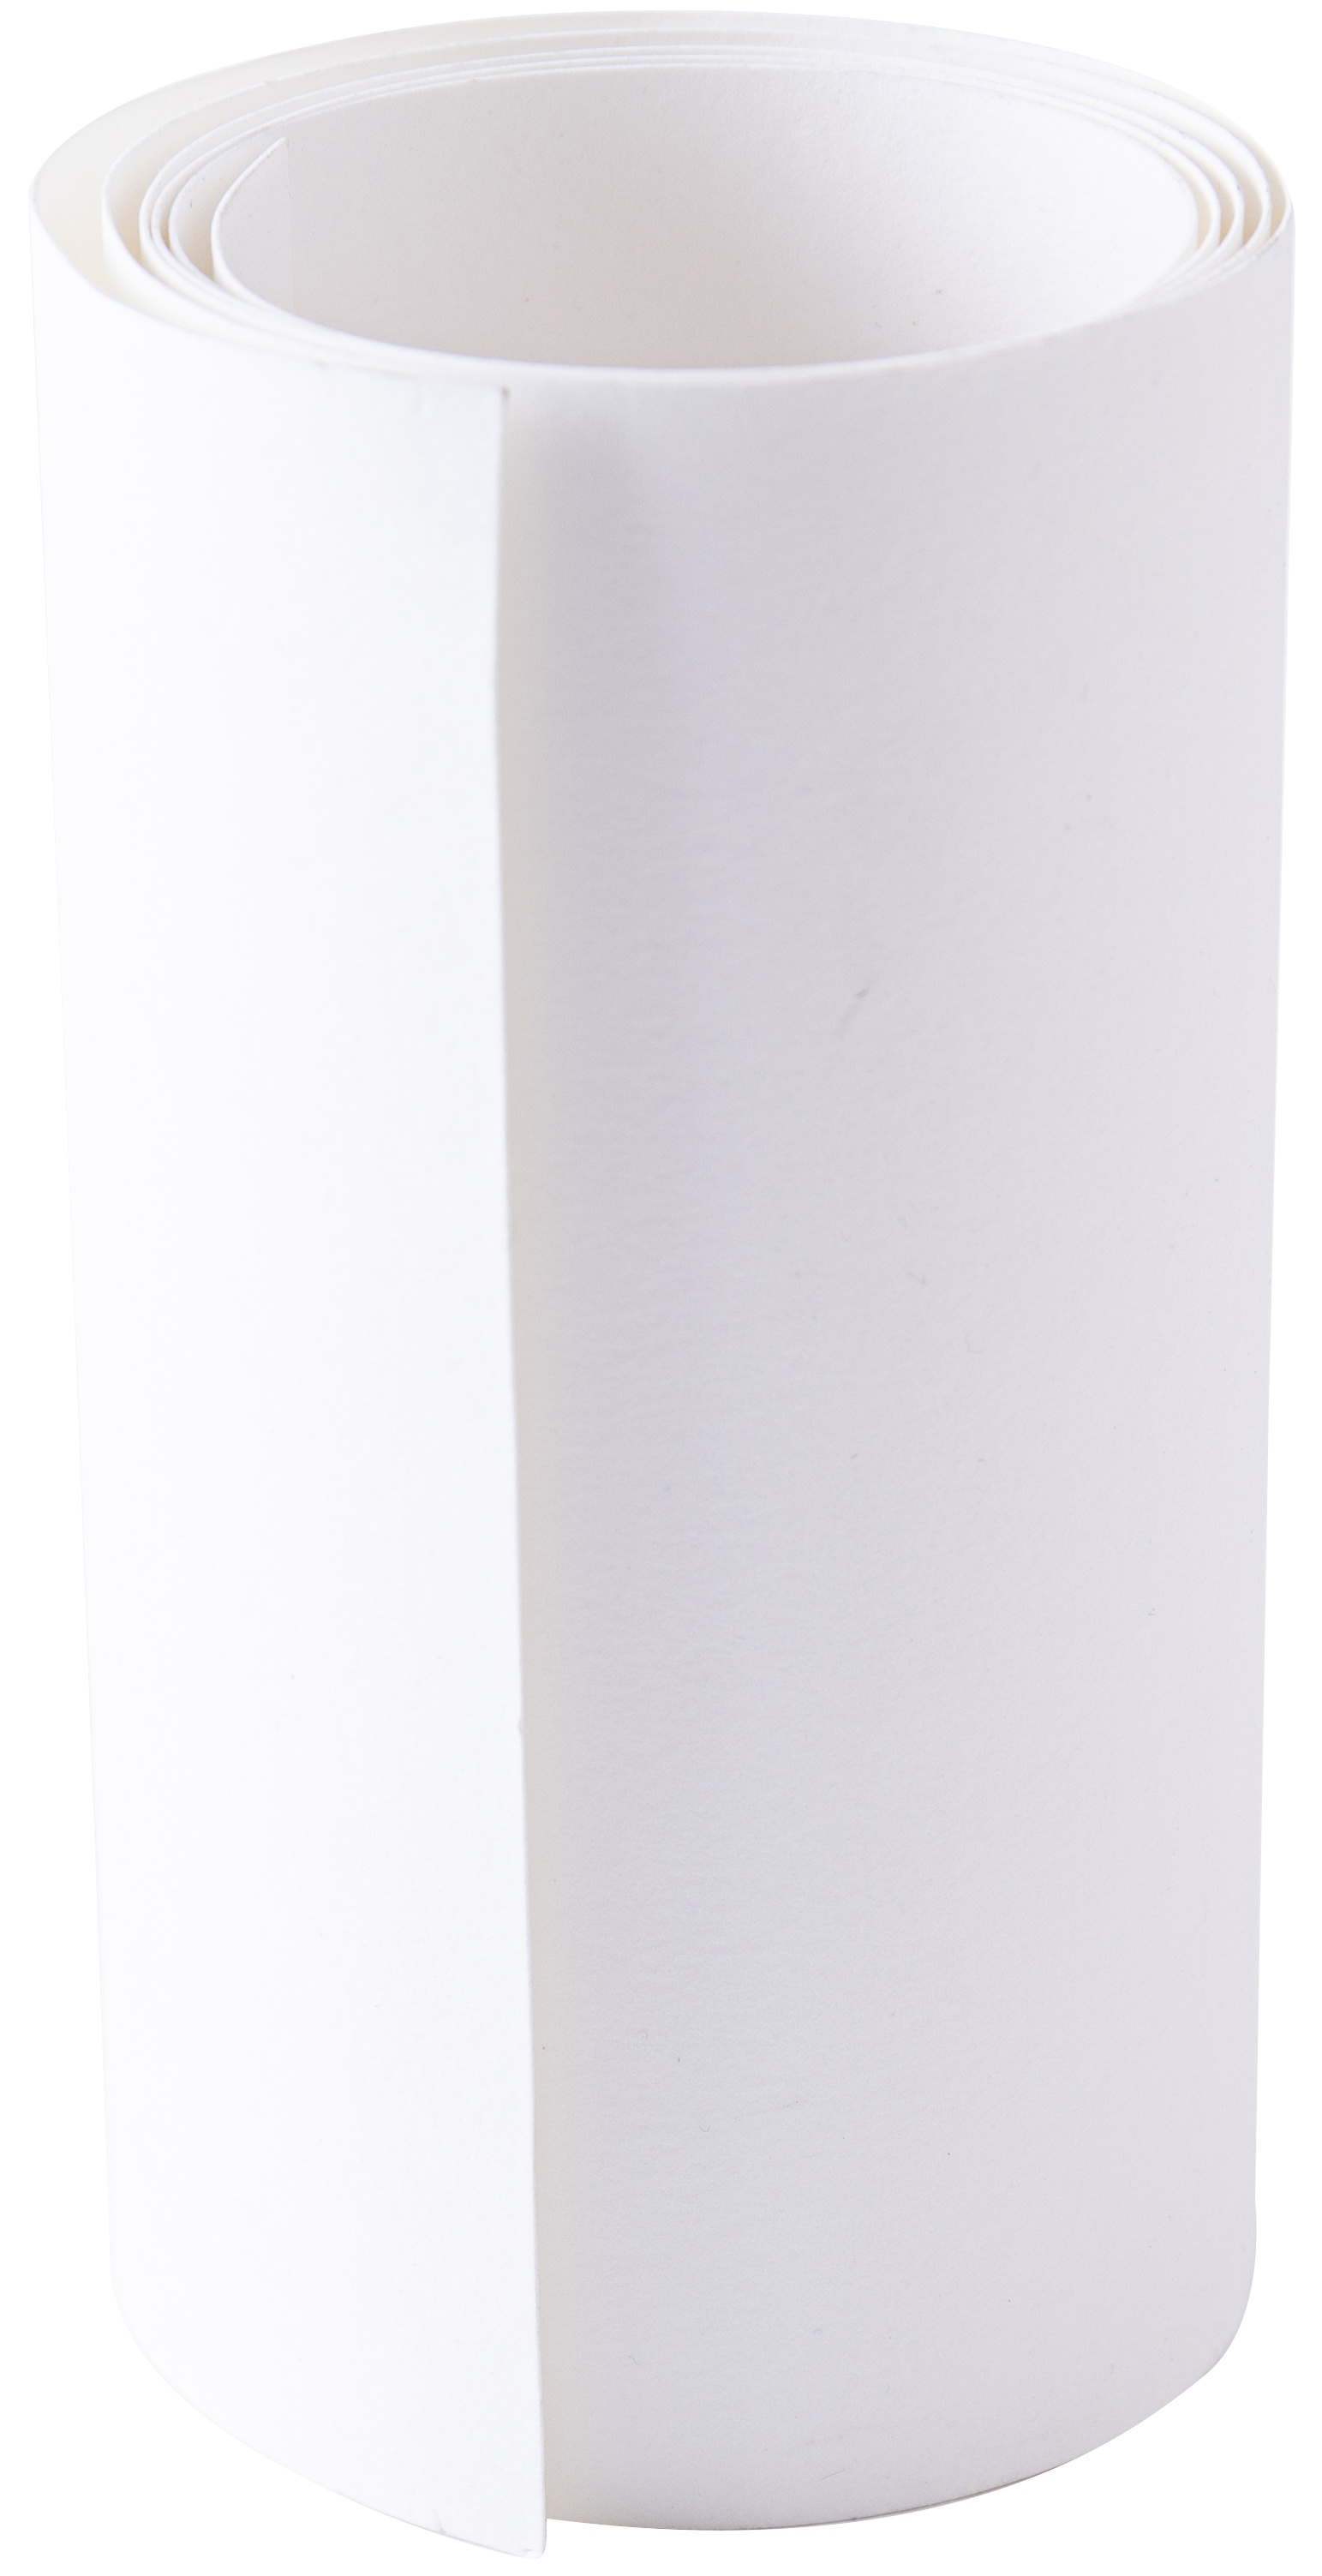 Sizzix Surfacez Texture Roll 6X48-White